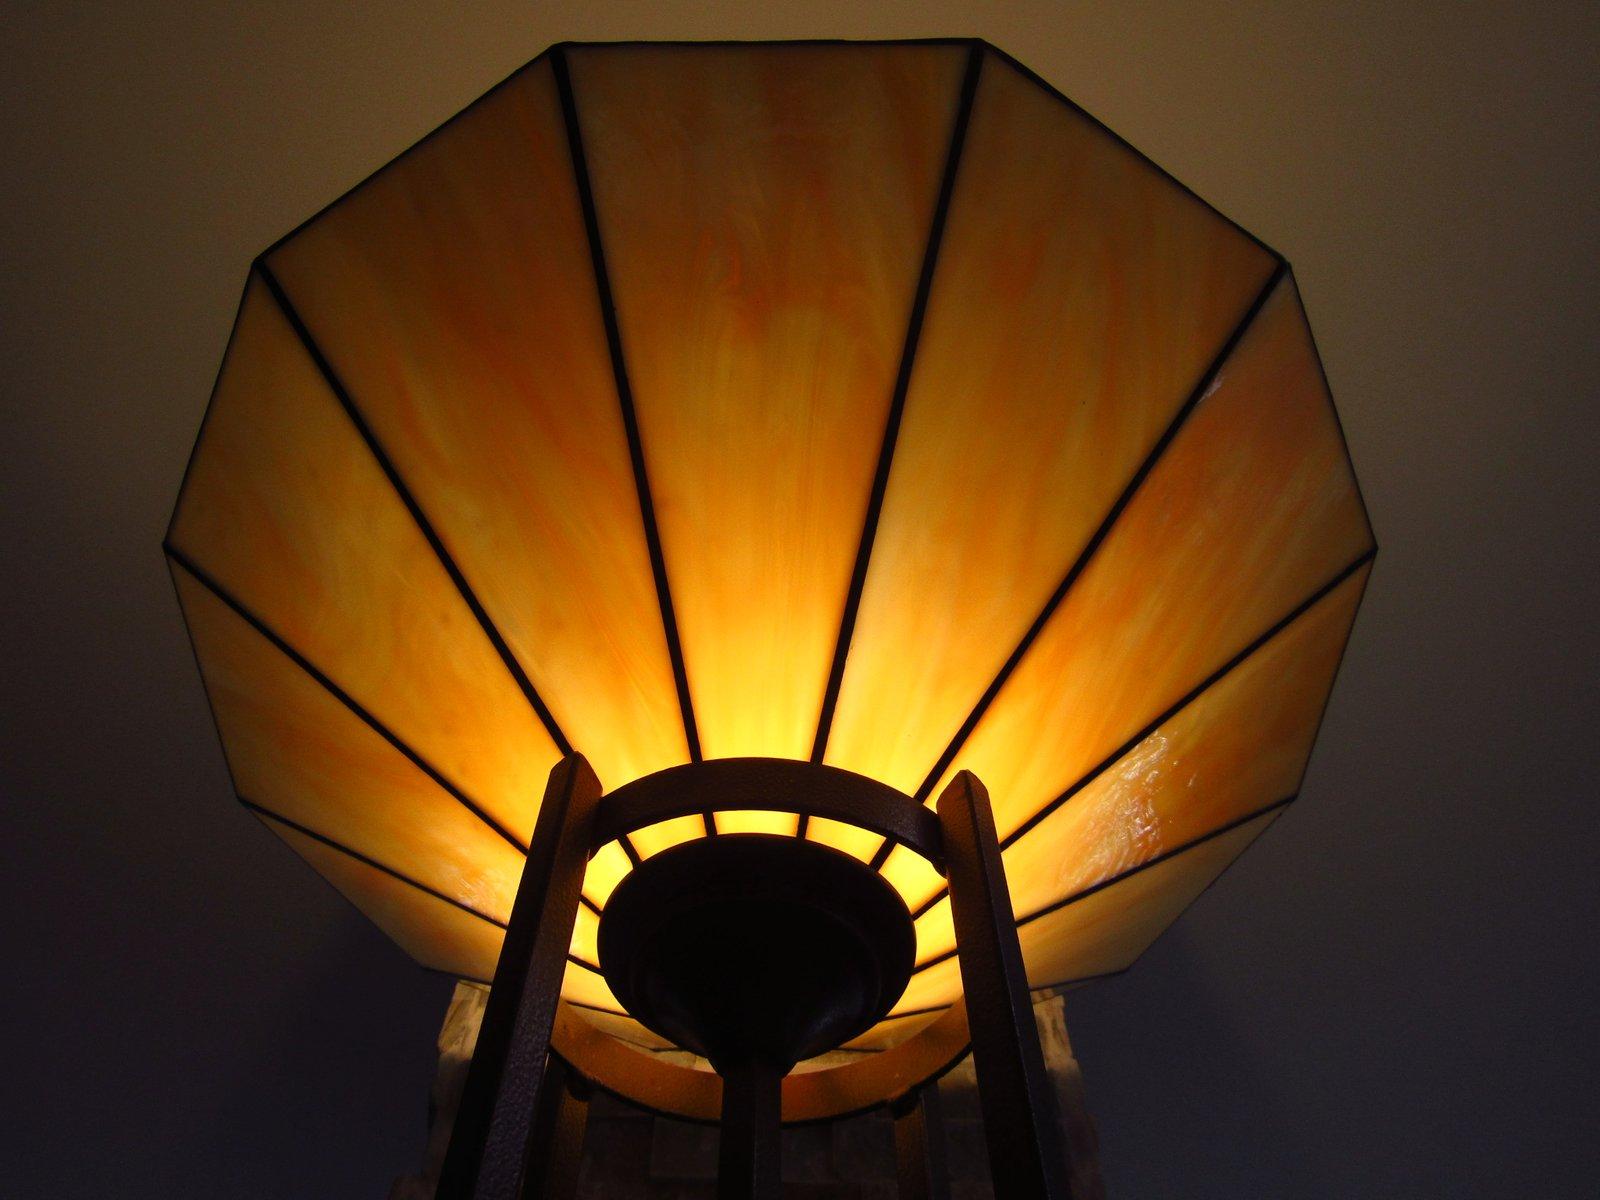 art d co stehlampe aus glas 1940er bei pamono kaufen. Black Bedroom Furniture Sets. Home Design Ideas